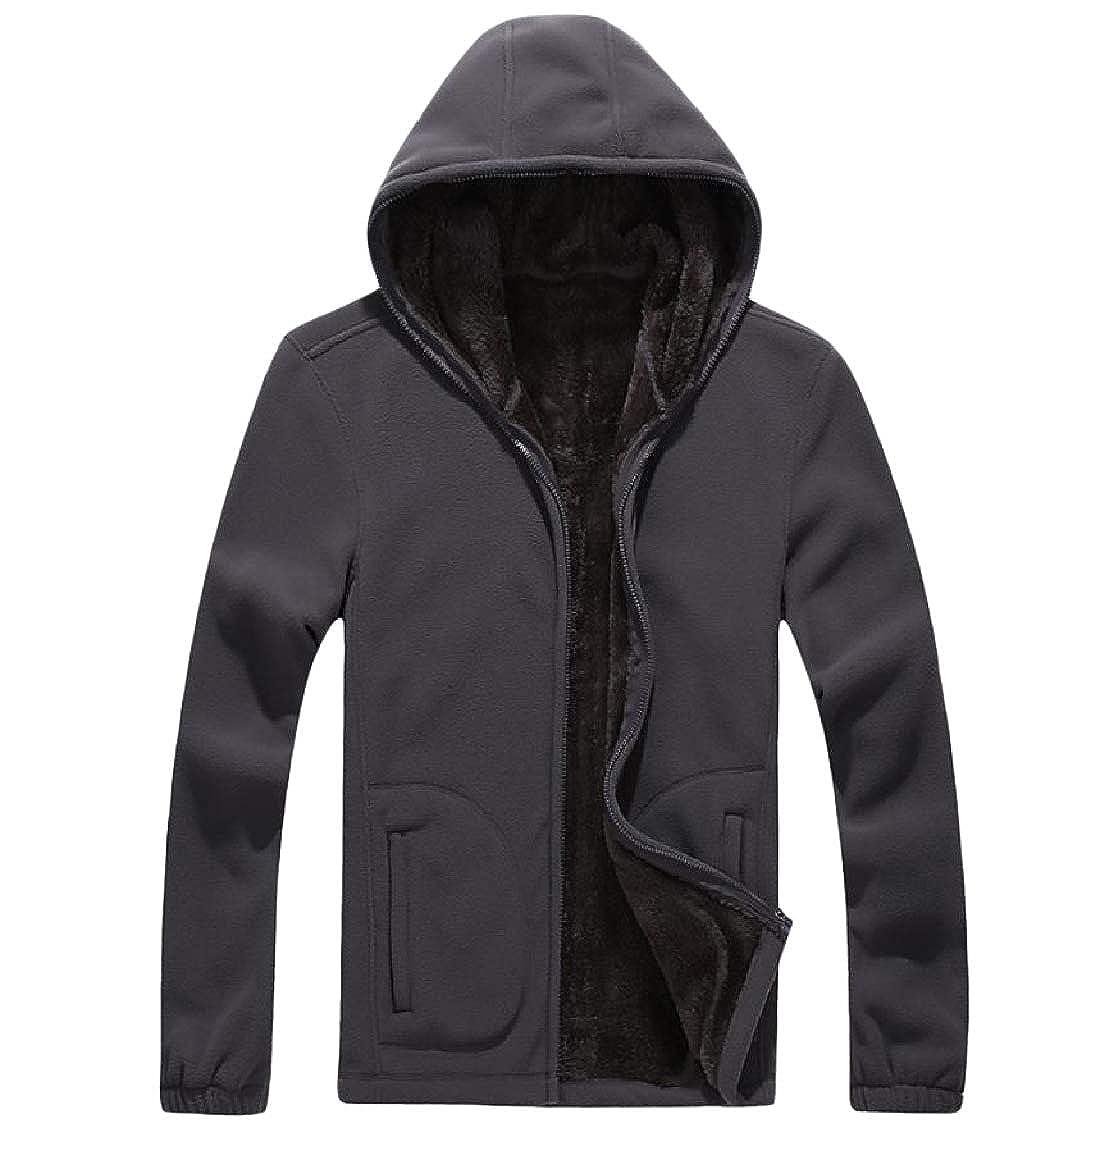 Vska Mens Oversized Warm Fall Winter Fitness Hooded Zip-Up Sweatshirts